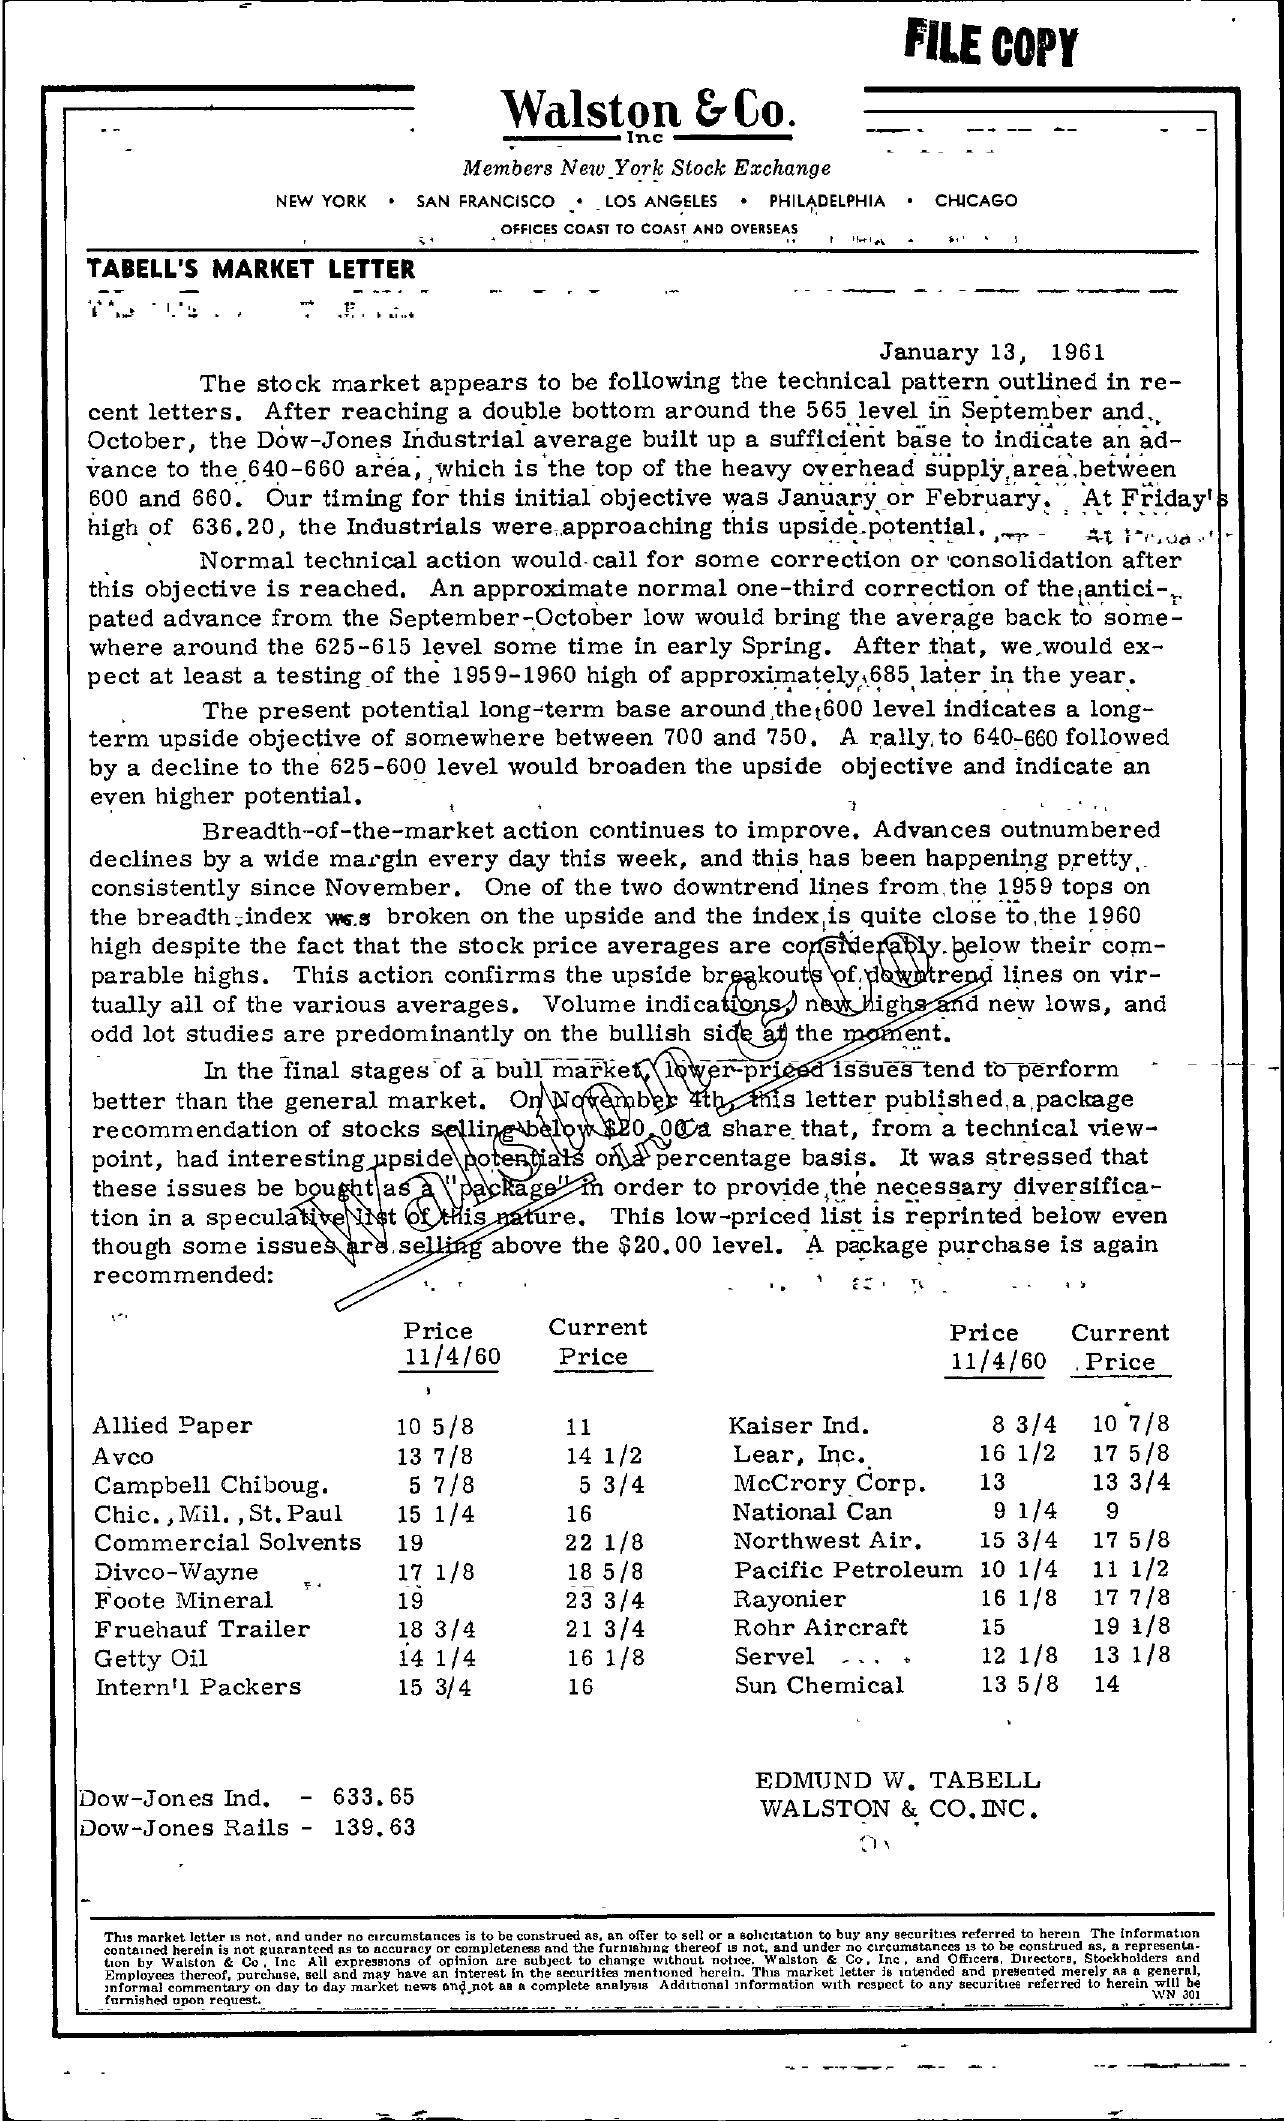 Tabell's Market Letter - January 13, 1961